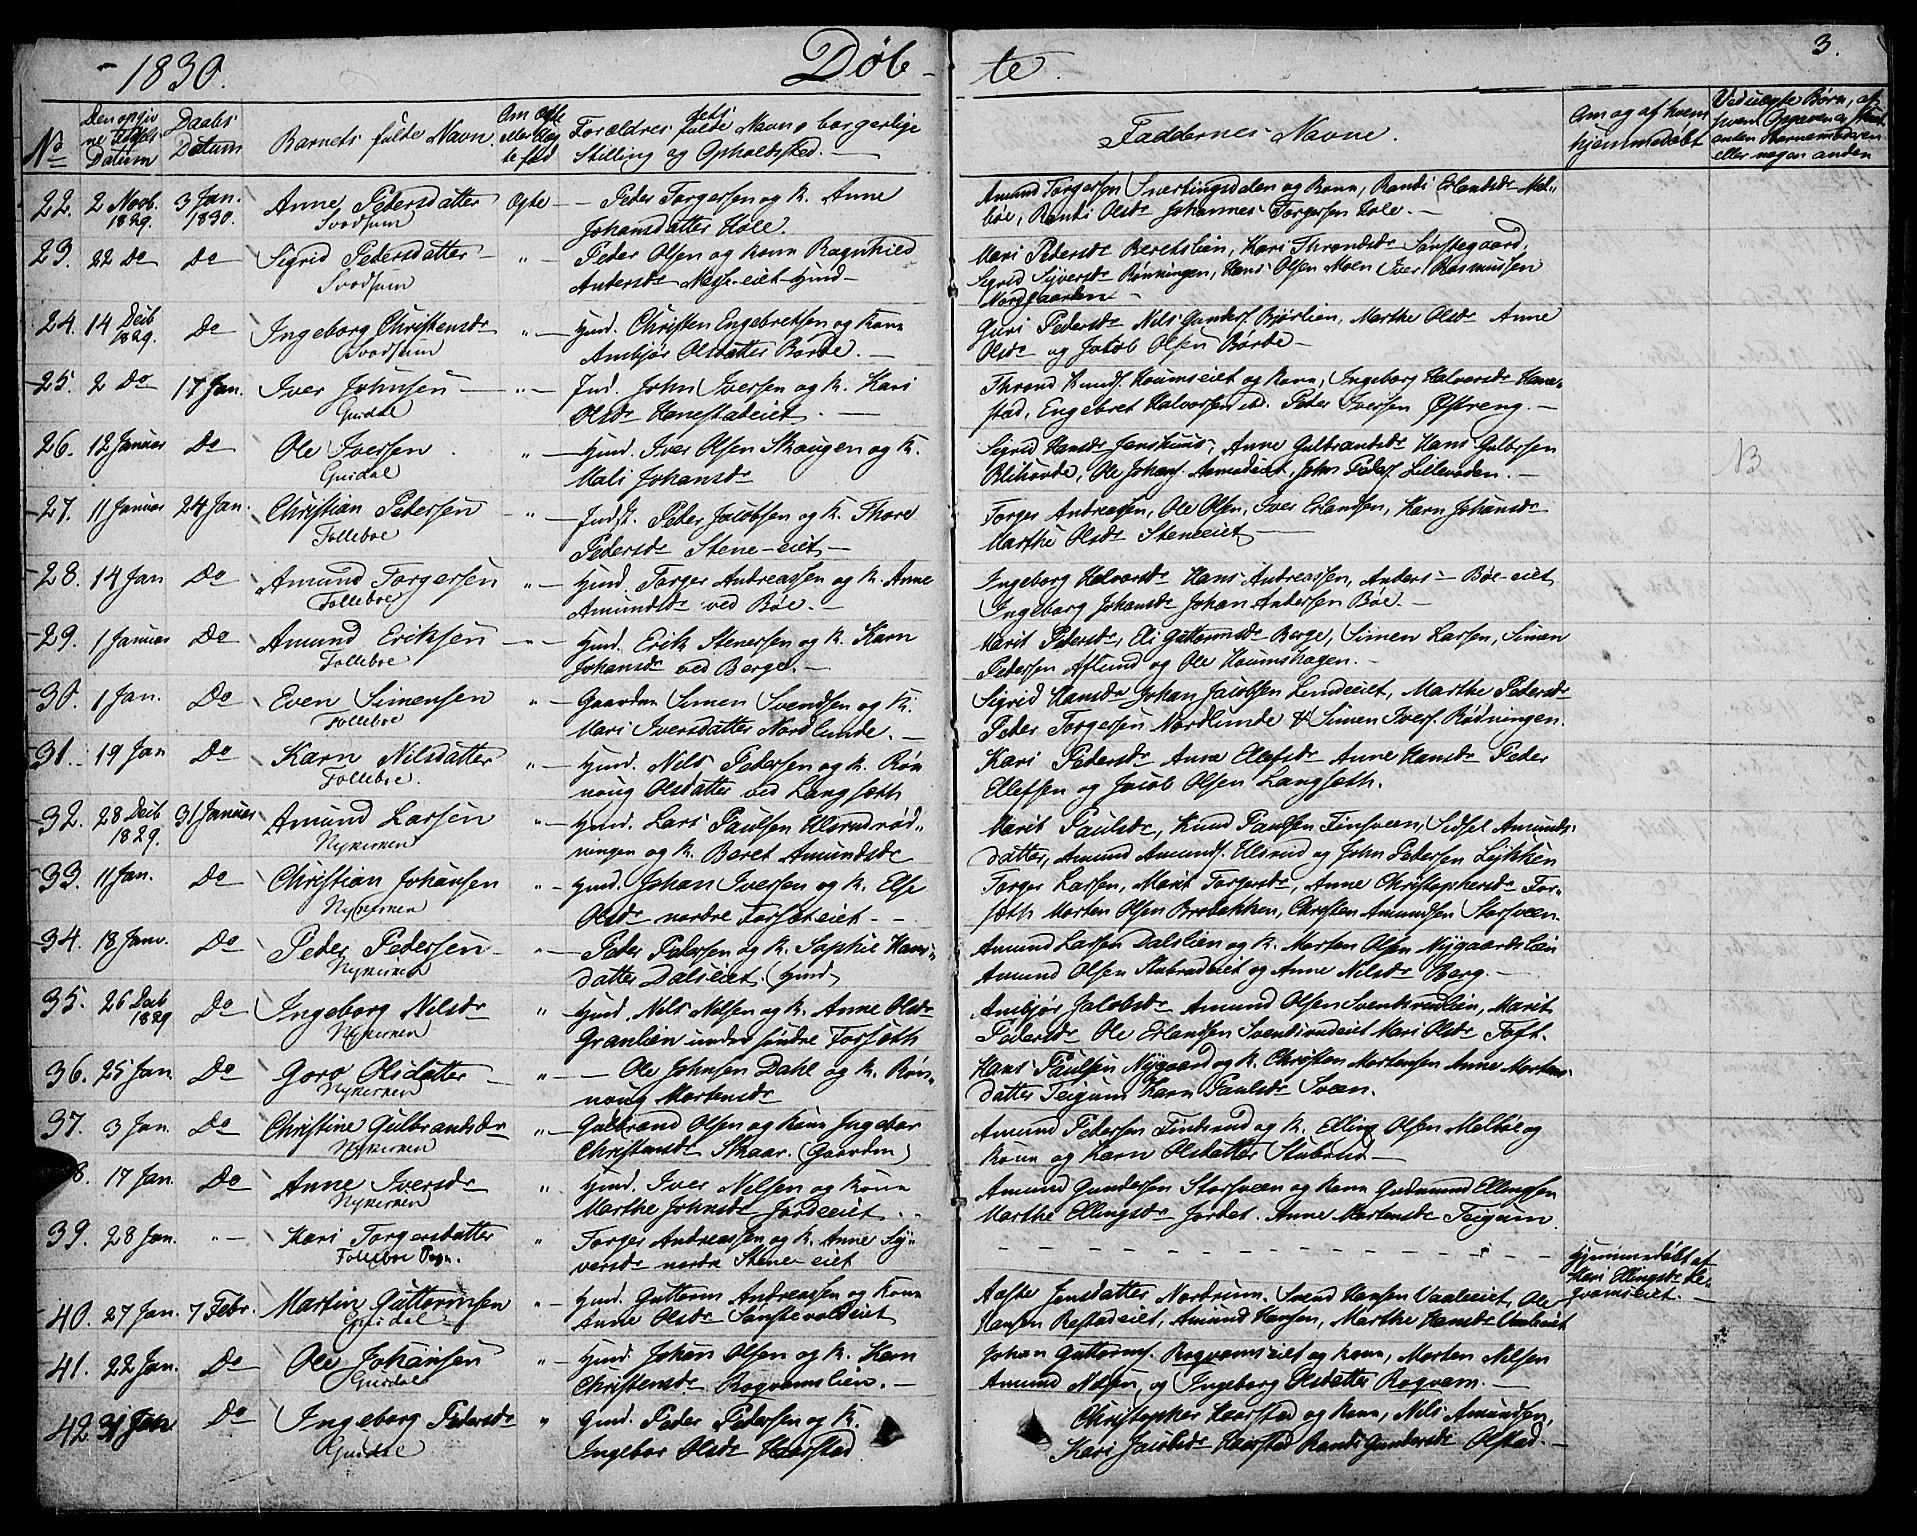 SAH, Gausdal prestekontor, Ministerialbok nr. 6, 1830-1839, s. 3